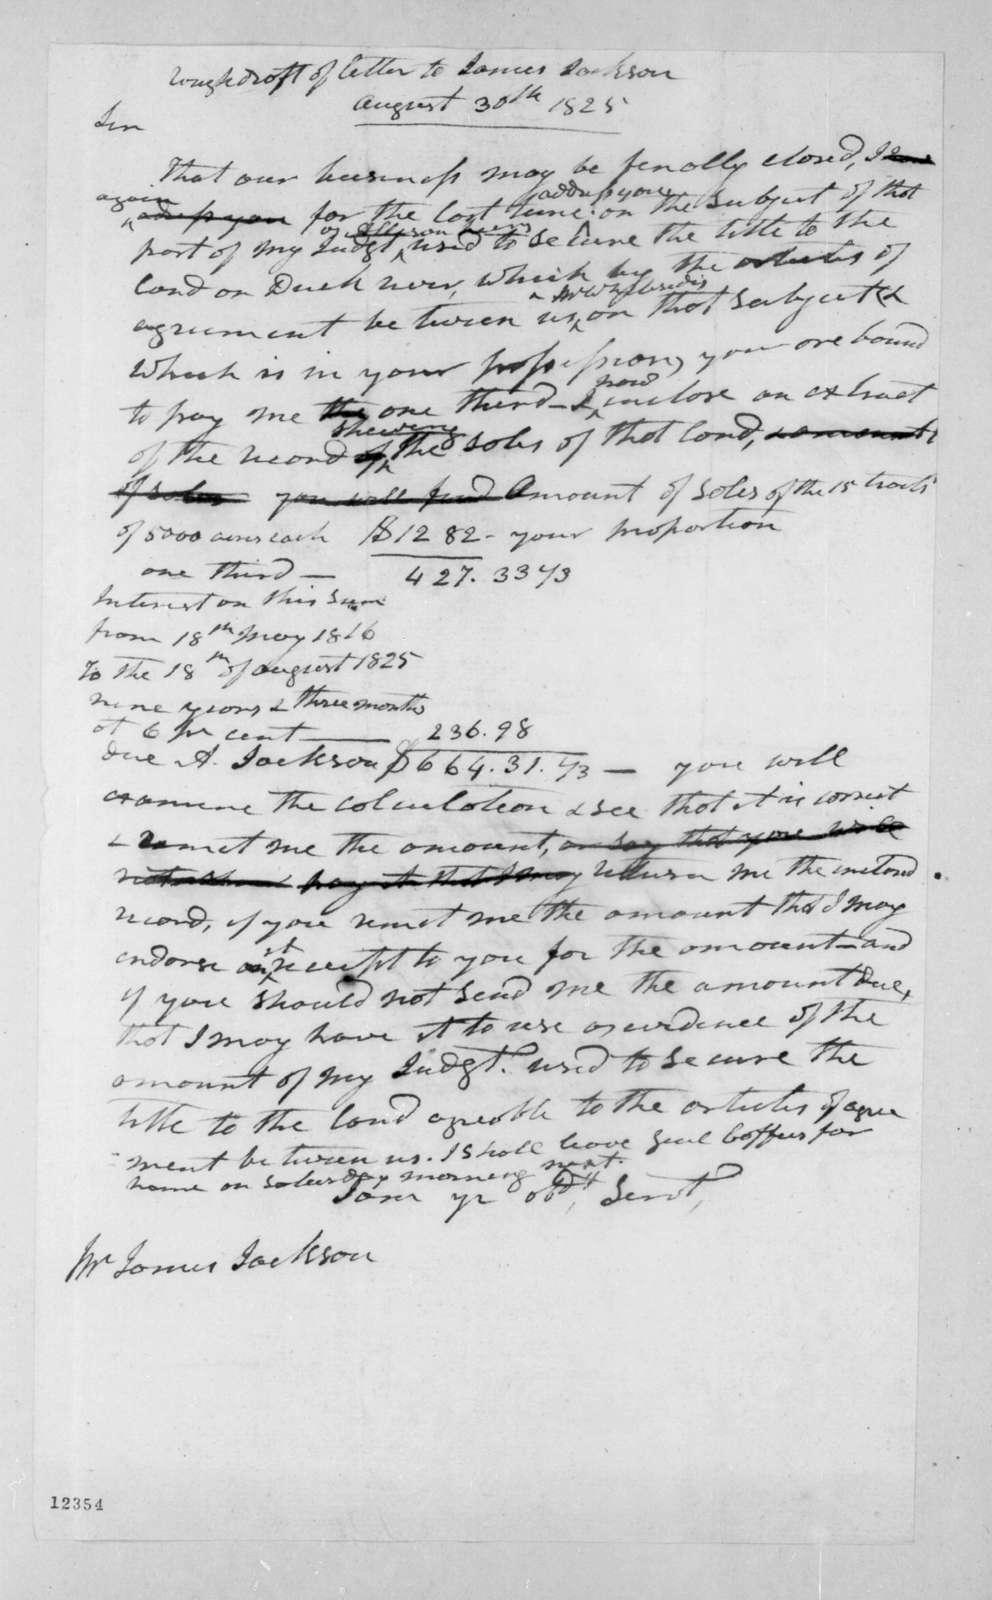 Andrew Jackson to James Jackson, August 30, 1825